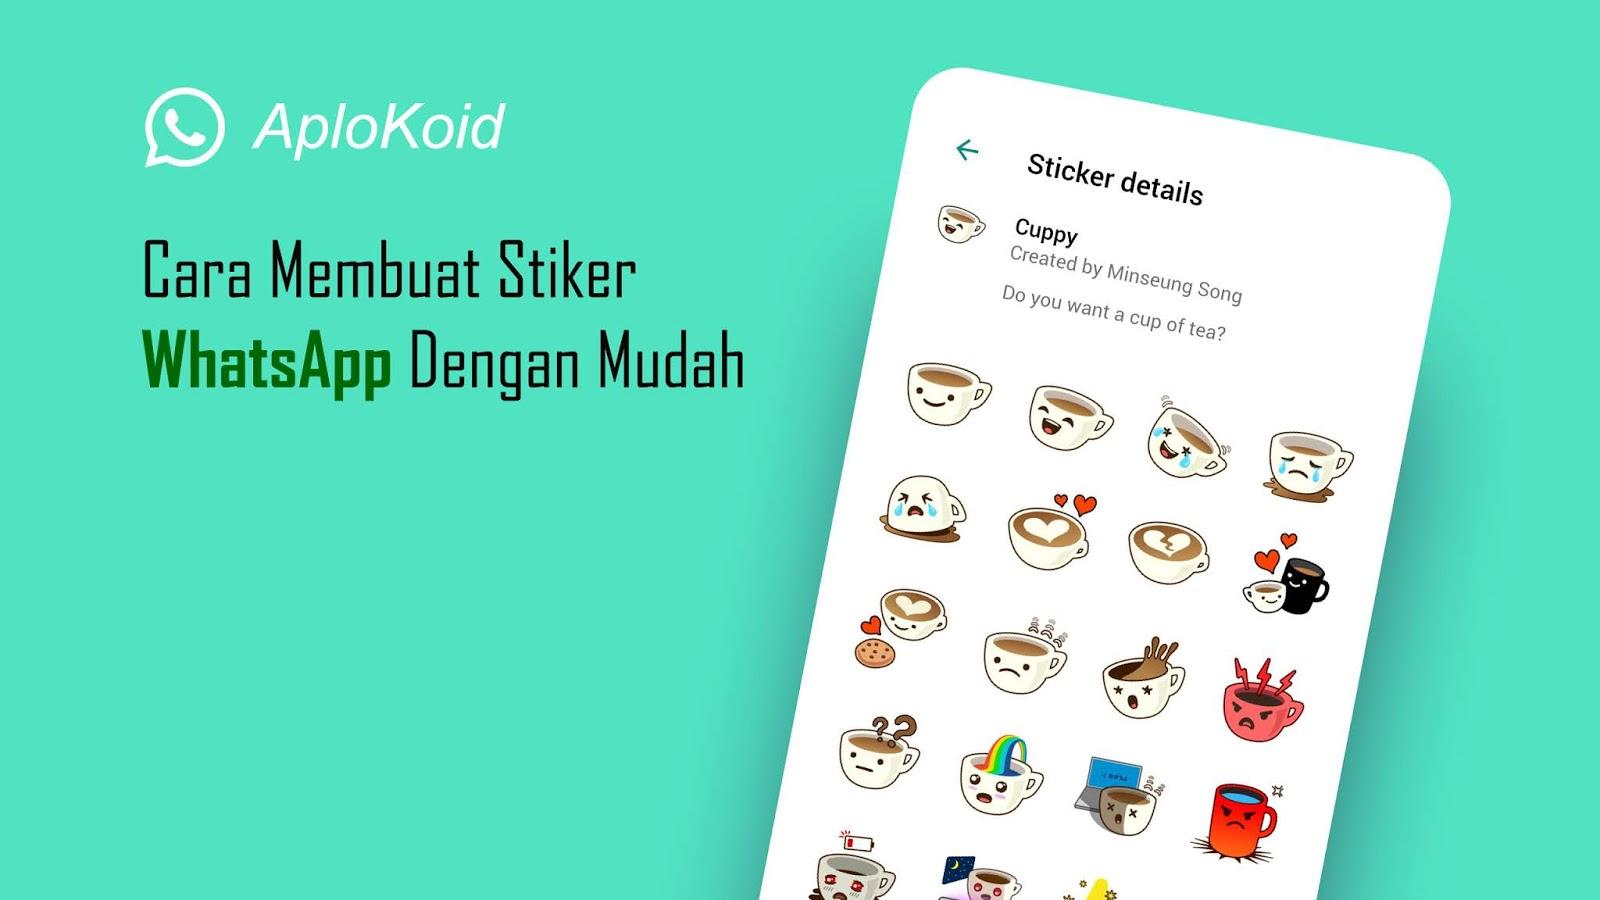 Cara Membuat Stiker WhatsApp Dengan Mudah